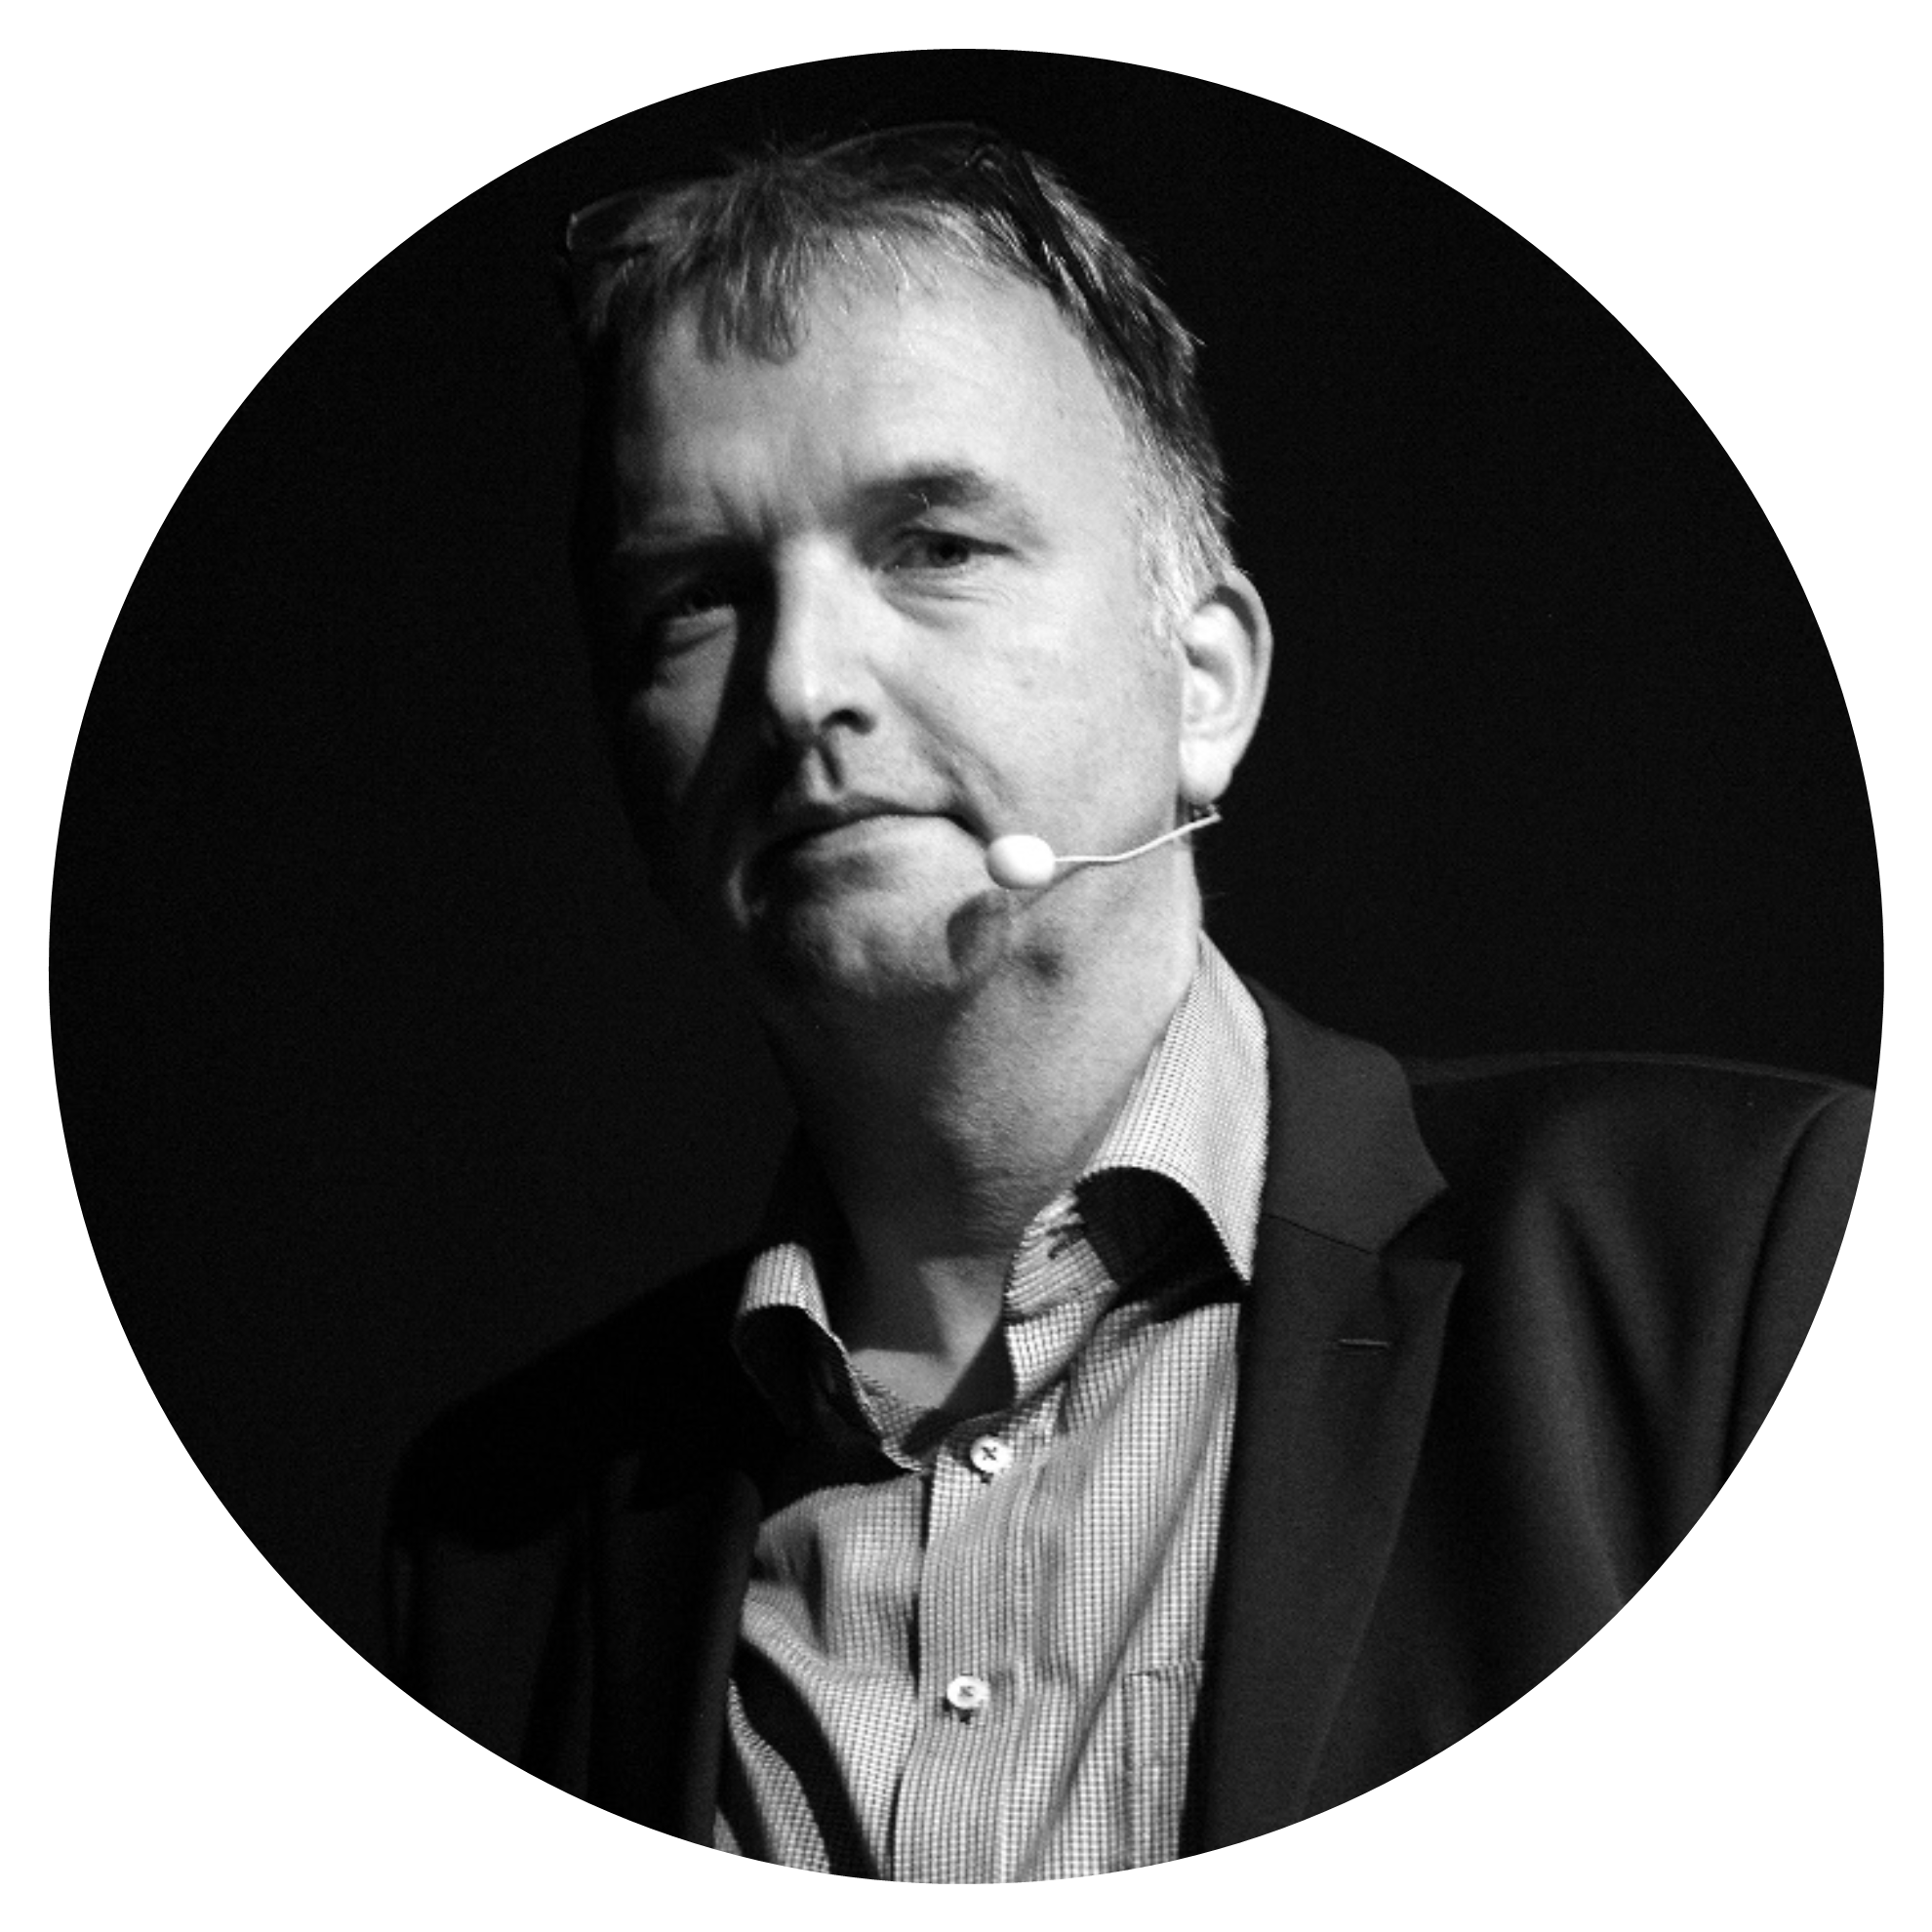 Christoph Ranze - Founder & CEO @ Encoway